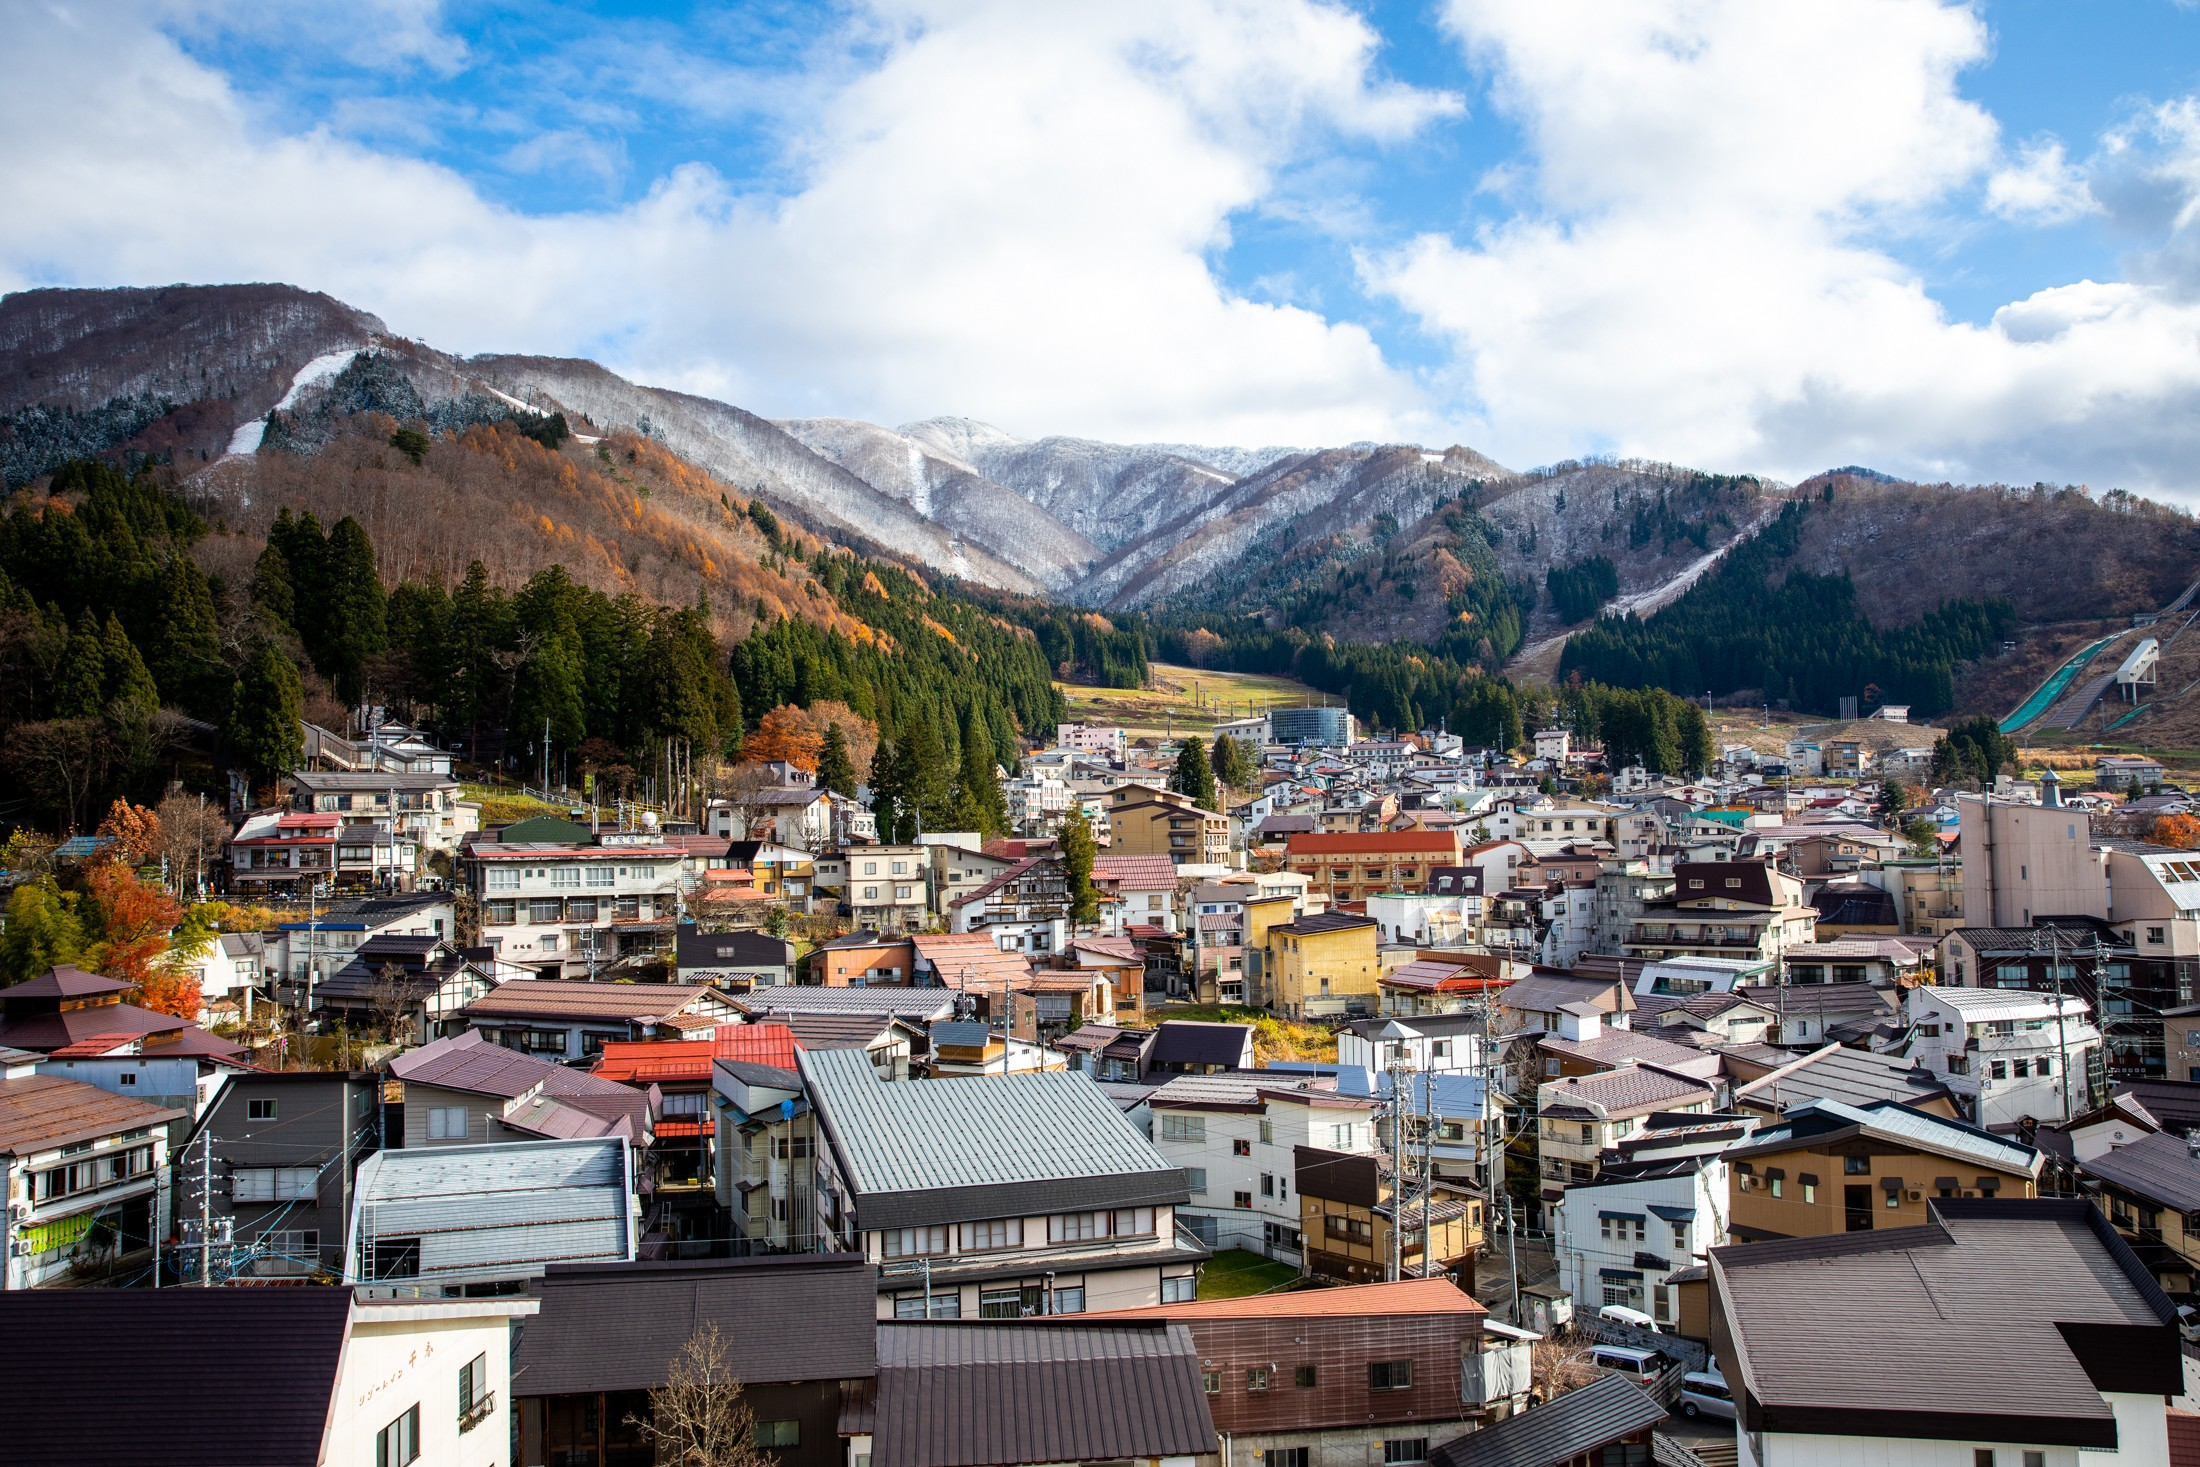 Bird's-eye view of Nozawa Onsen